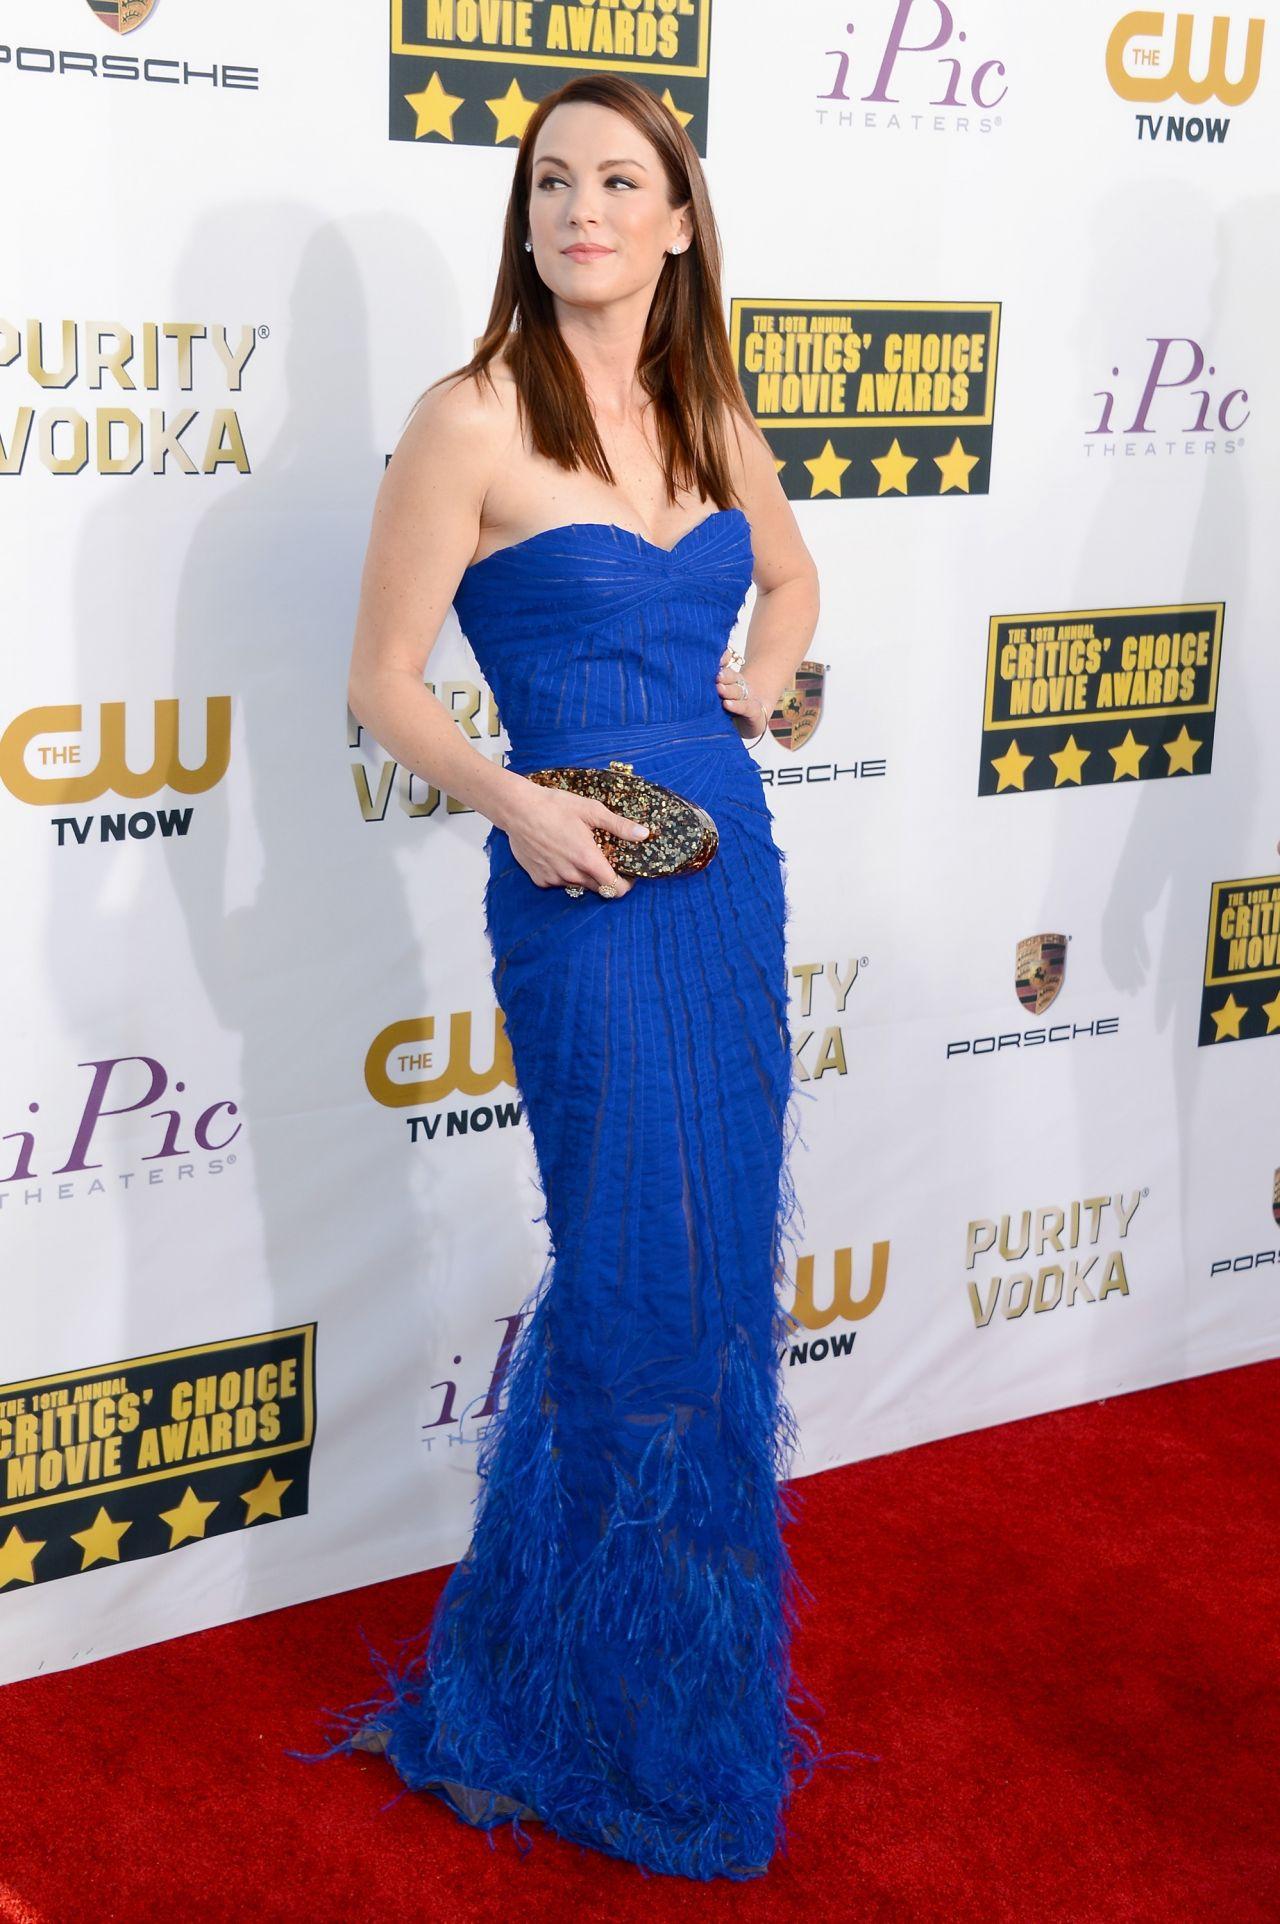 Critics Choice Movie Awards 2014 картинки